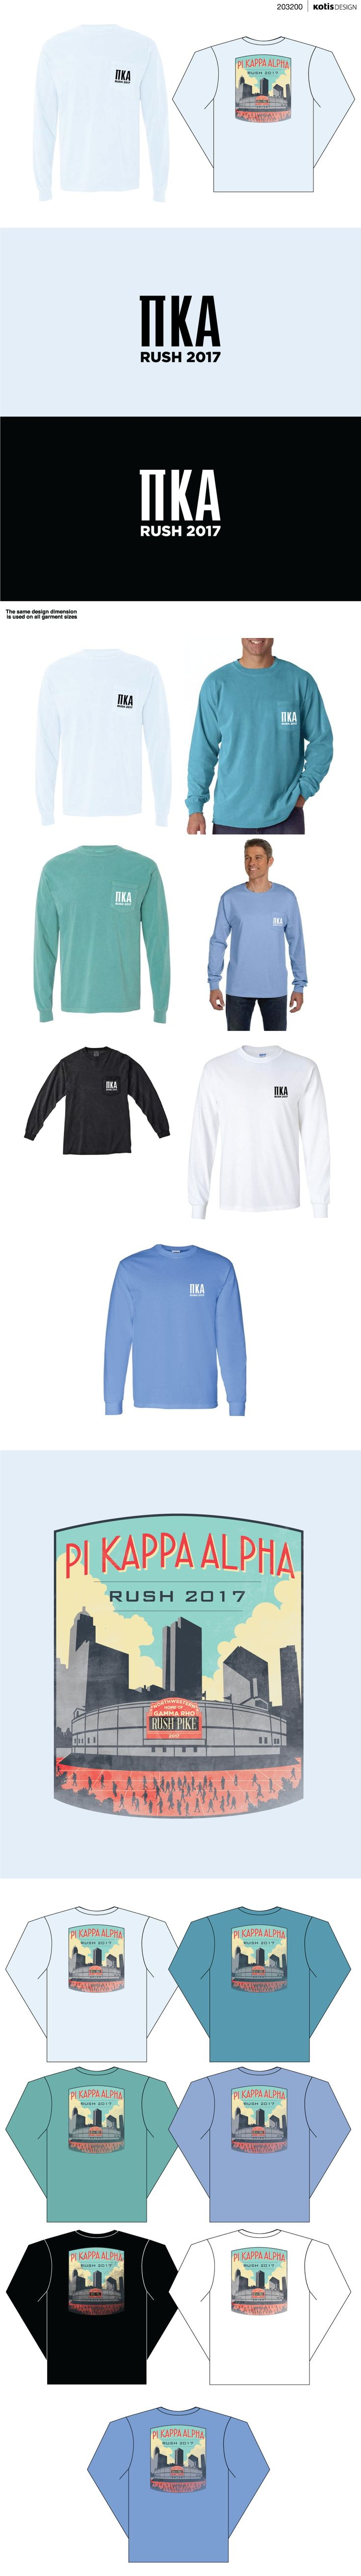 203200 - NU Pike | Rush shirts '17 - View Proof - Kotis Design